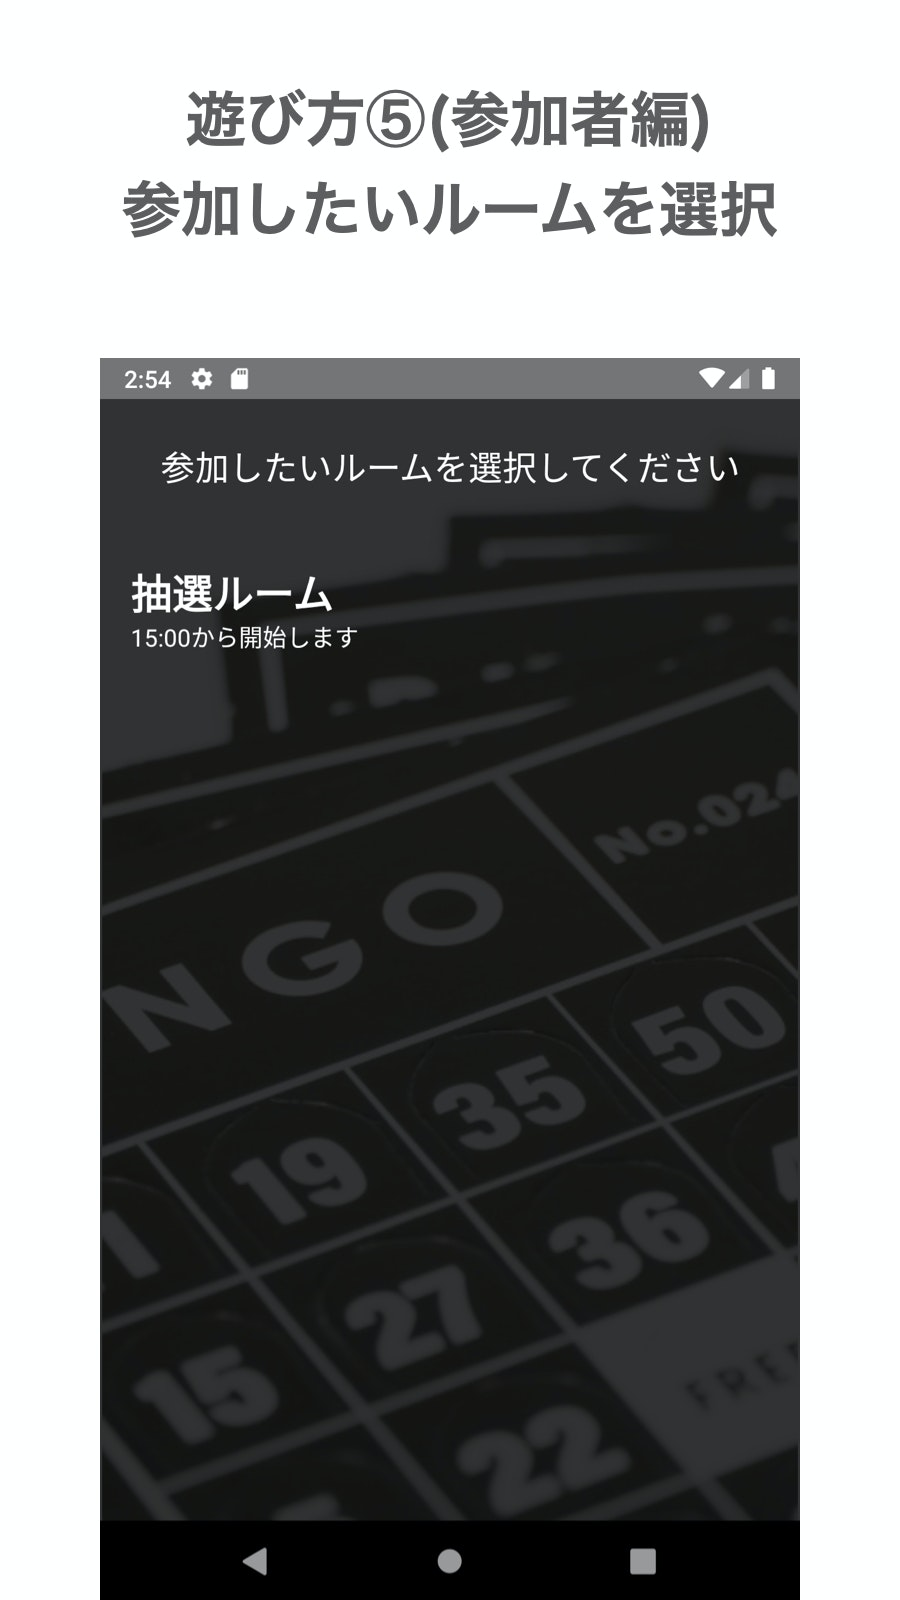 images.006.jpeg